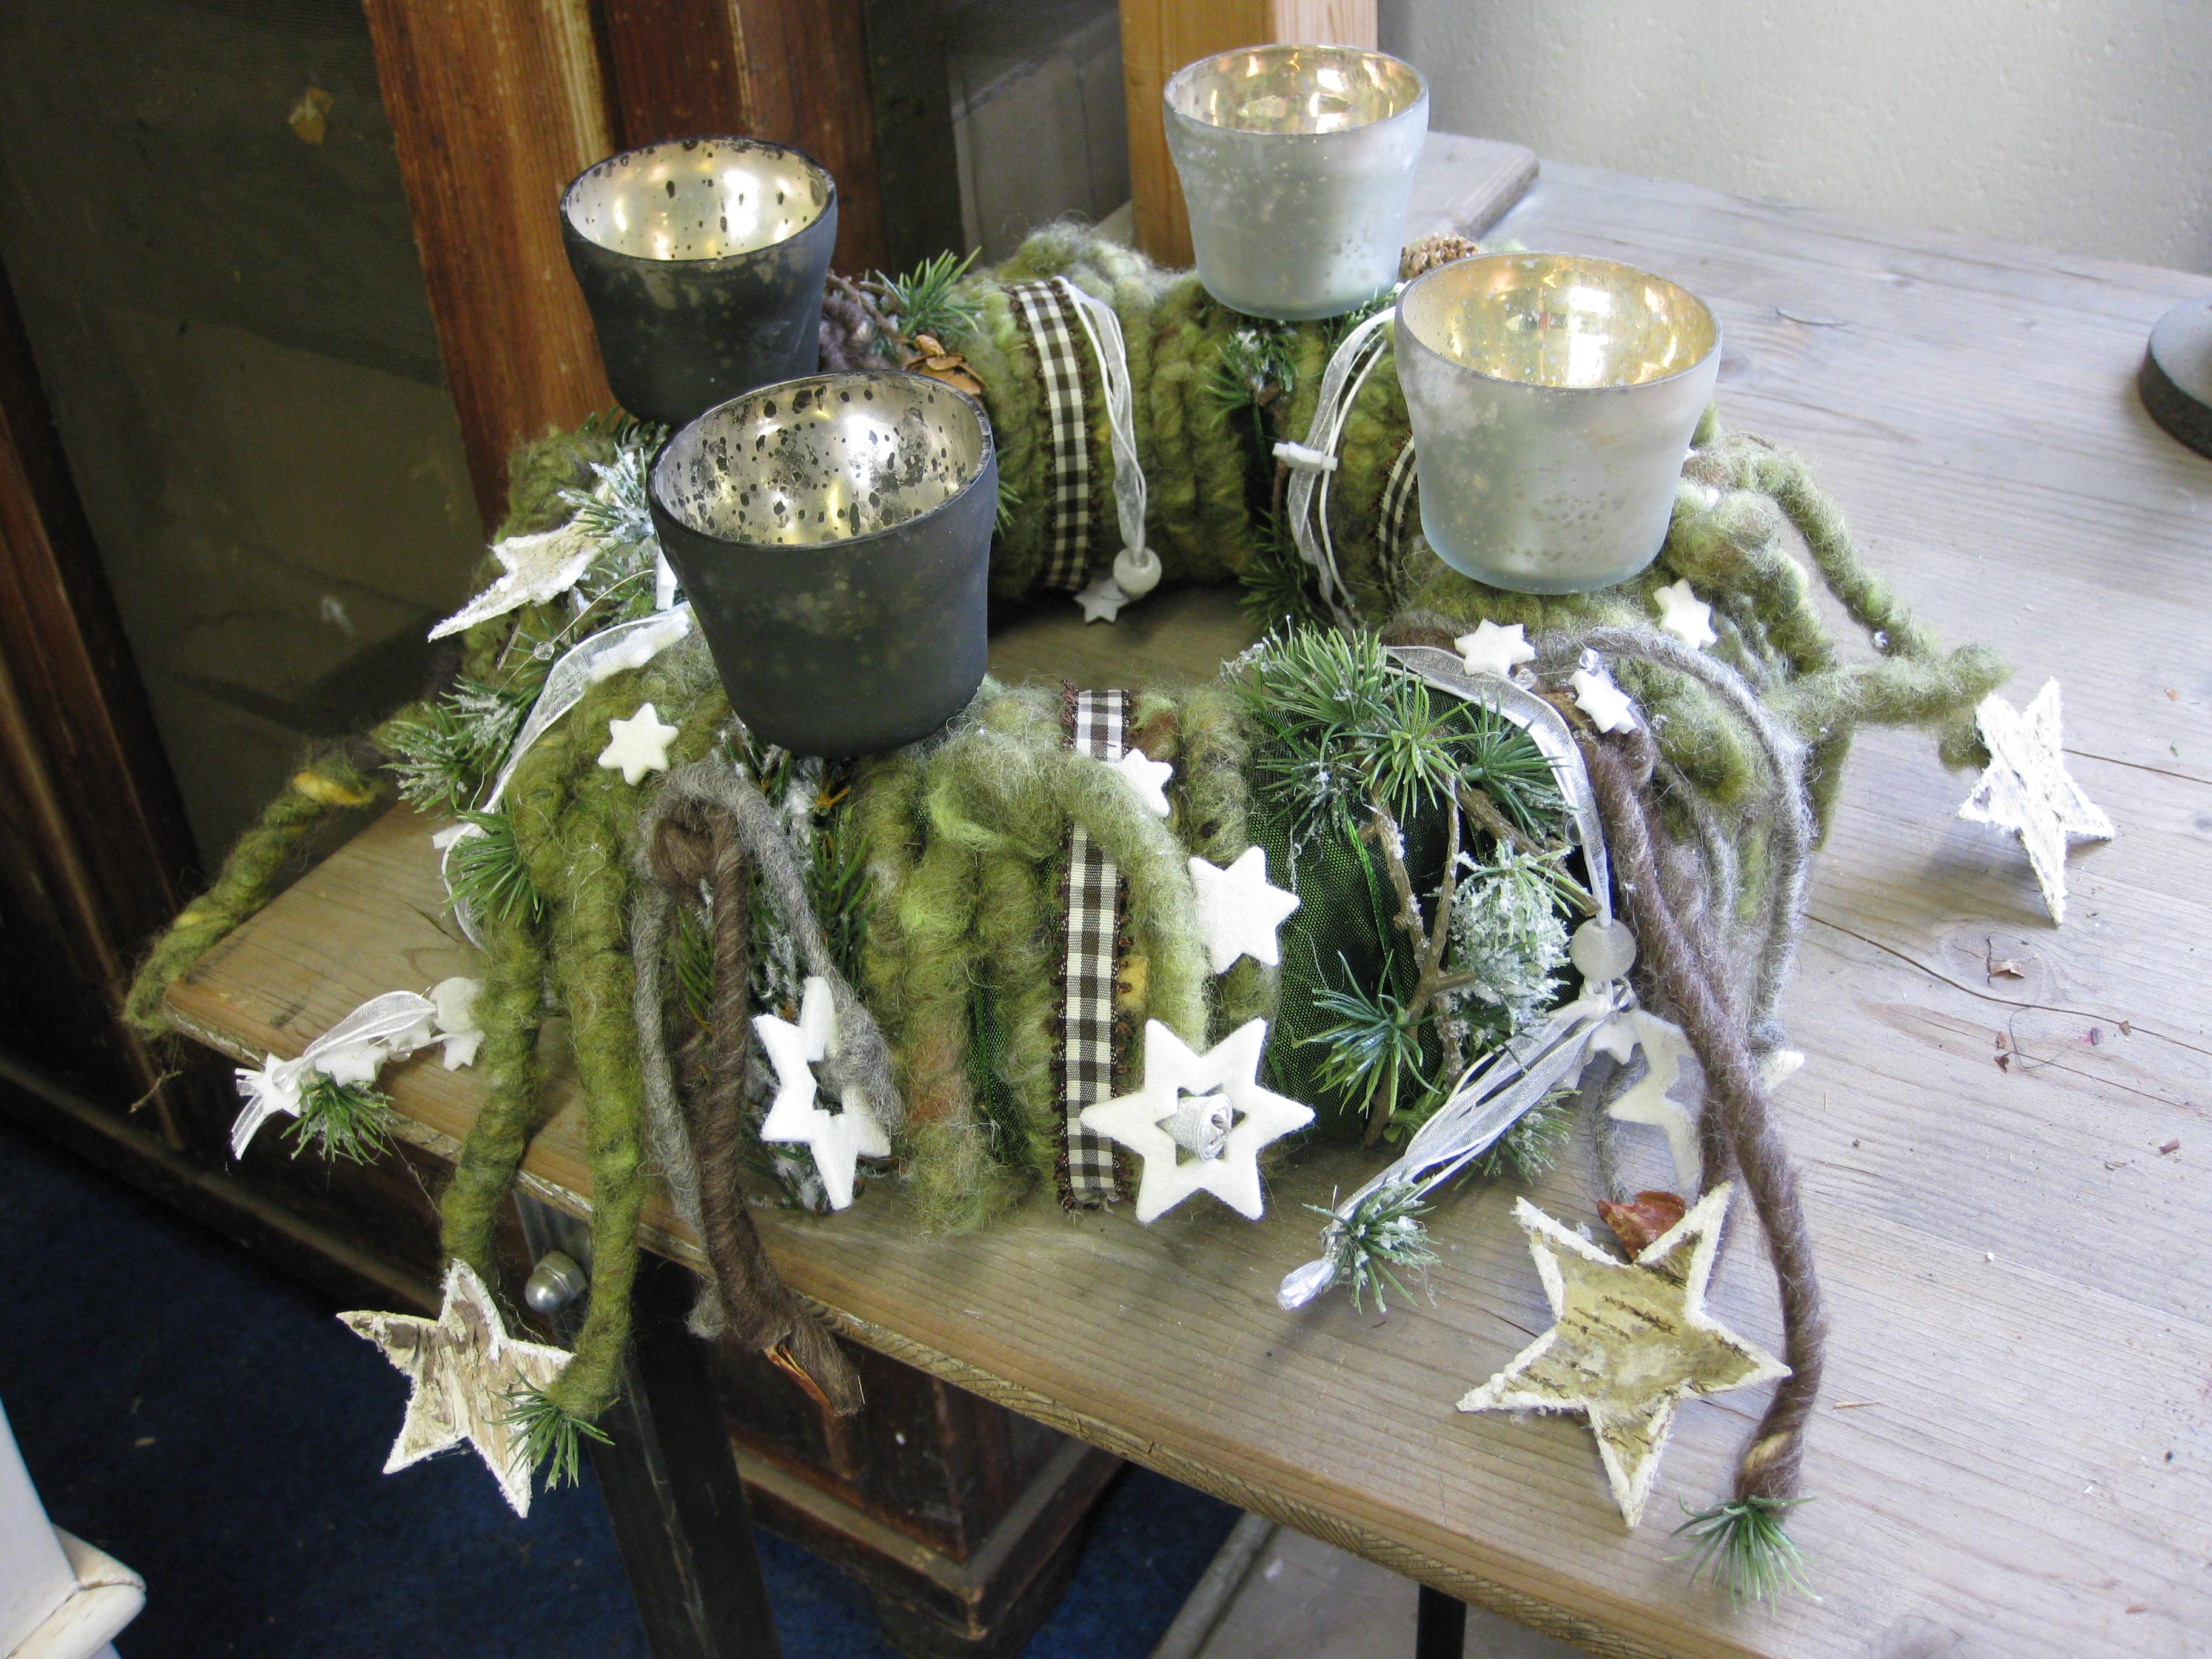 Seminare achtung wally klett in k ln um 1 tag vorverlegt for Weihnachtstrends 2016 floristik